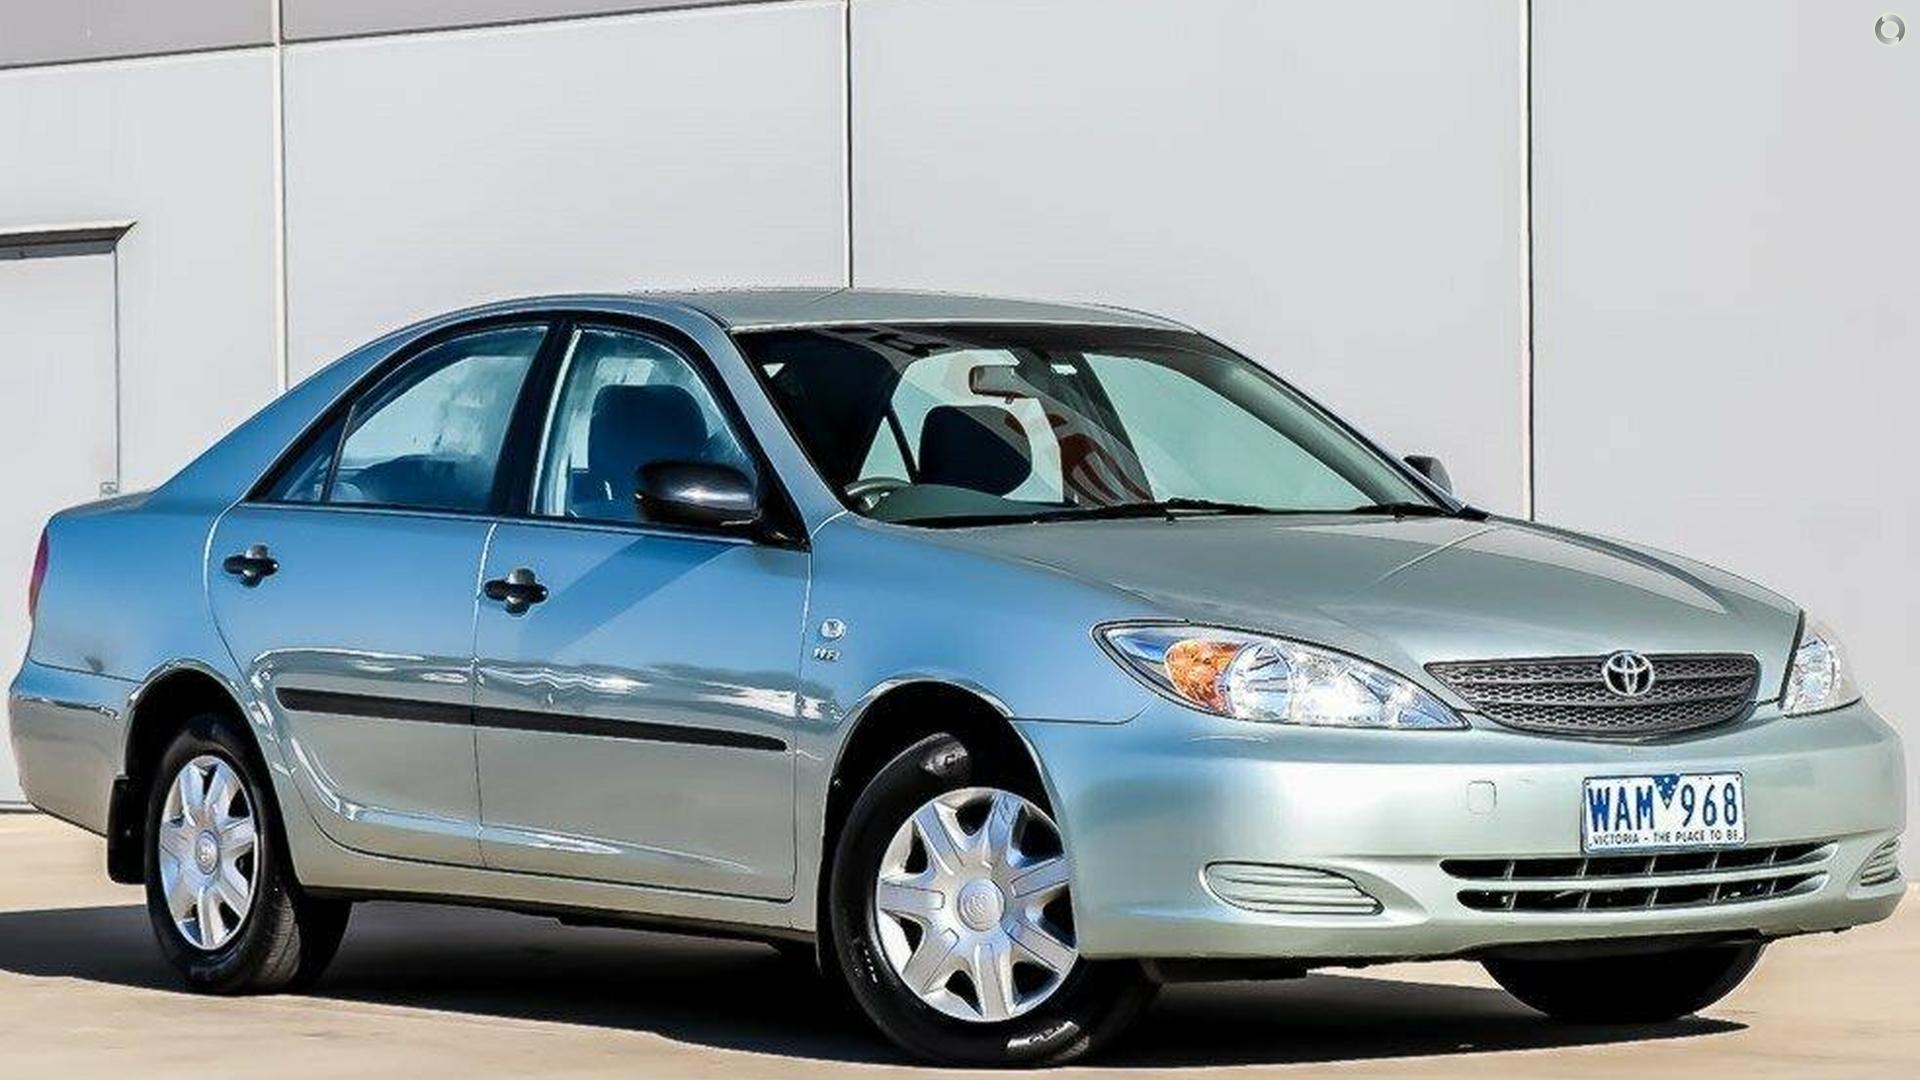 2004 Toyota Camry ACV36R